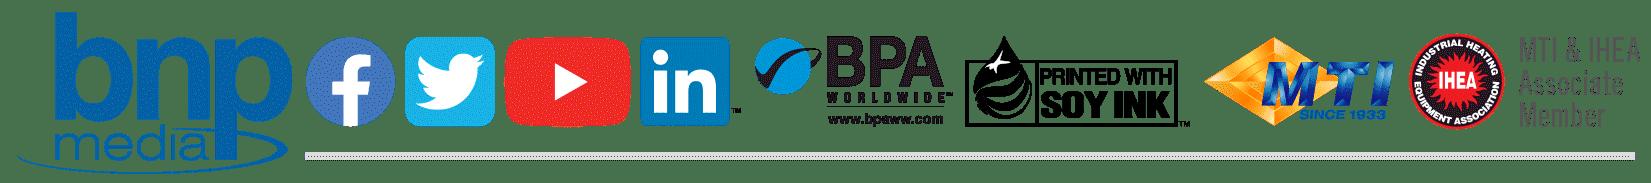 BNP Media, Facebook, Twitter, YouTube, LinkedIN, BPA, MTI, IHEA Logos